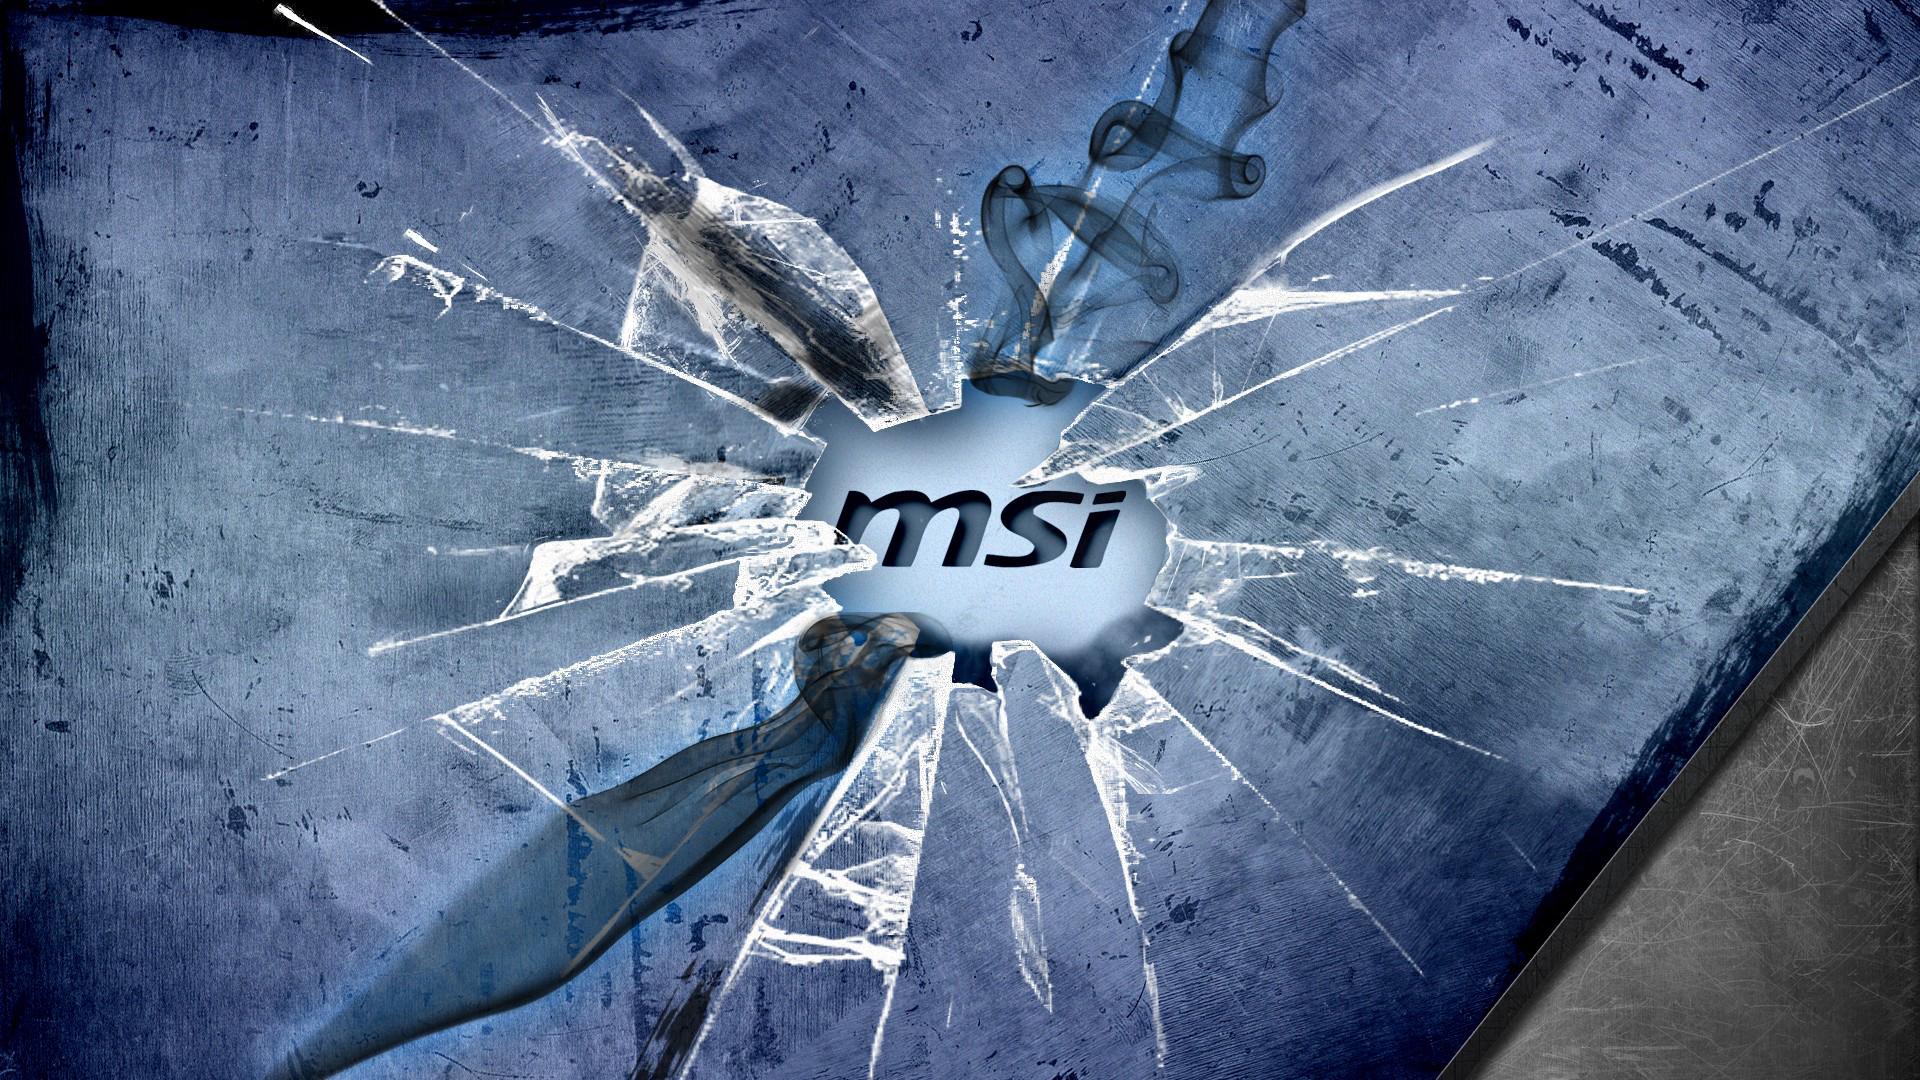 Msi logo crack glass 09 wallpaper hd msi cool crack broken glass logo voltagebd Images